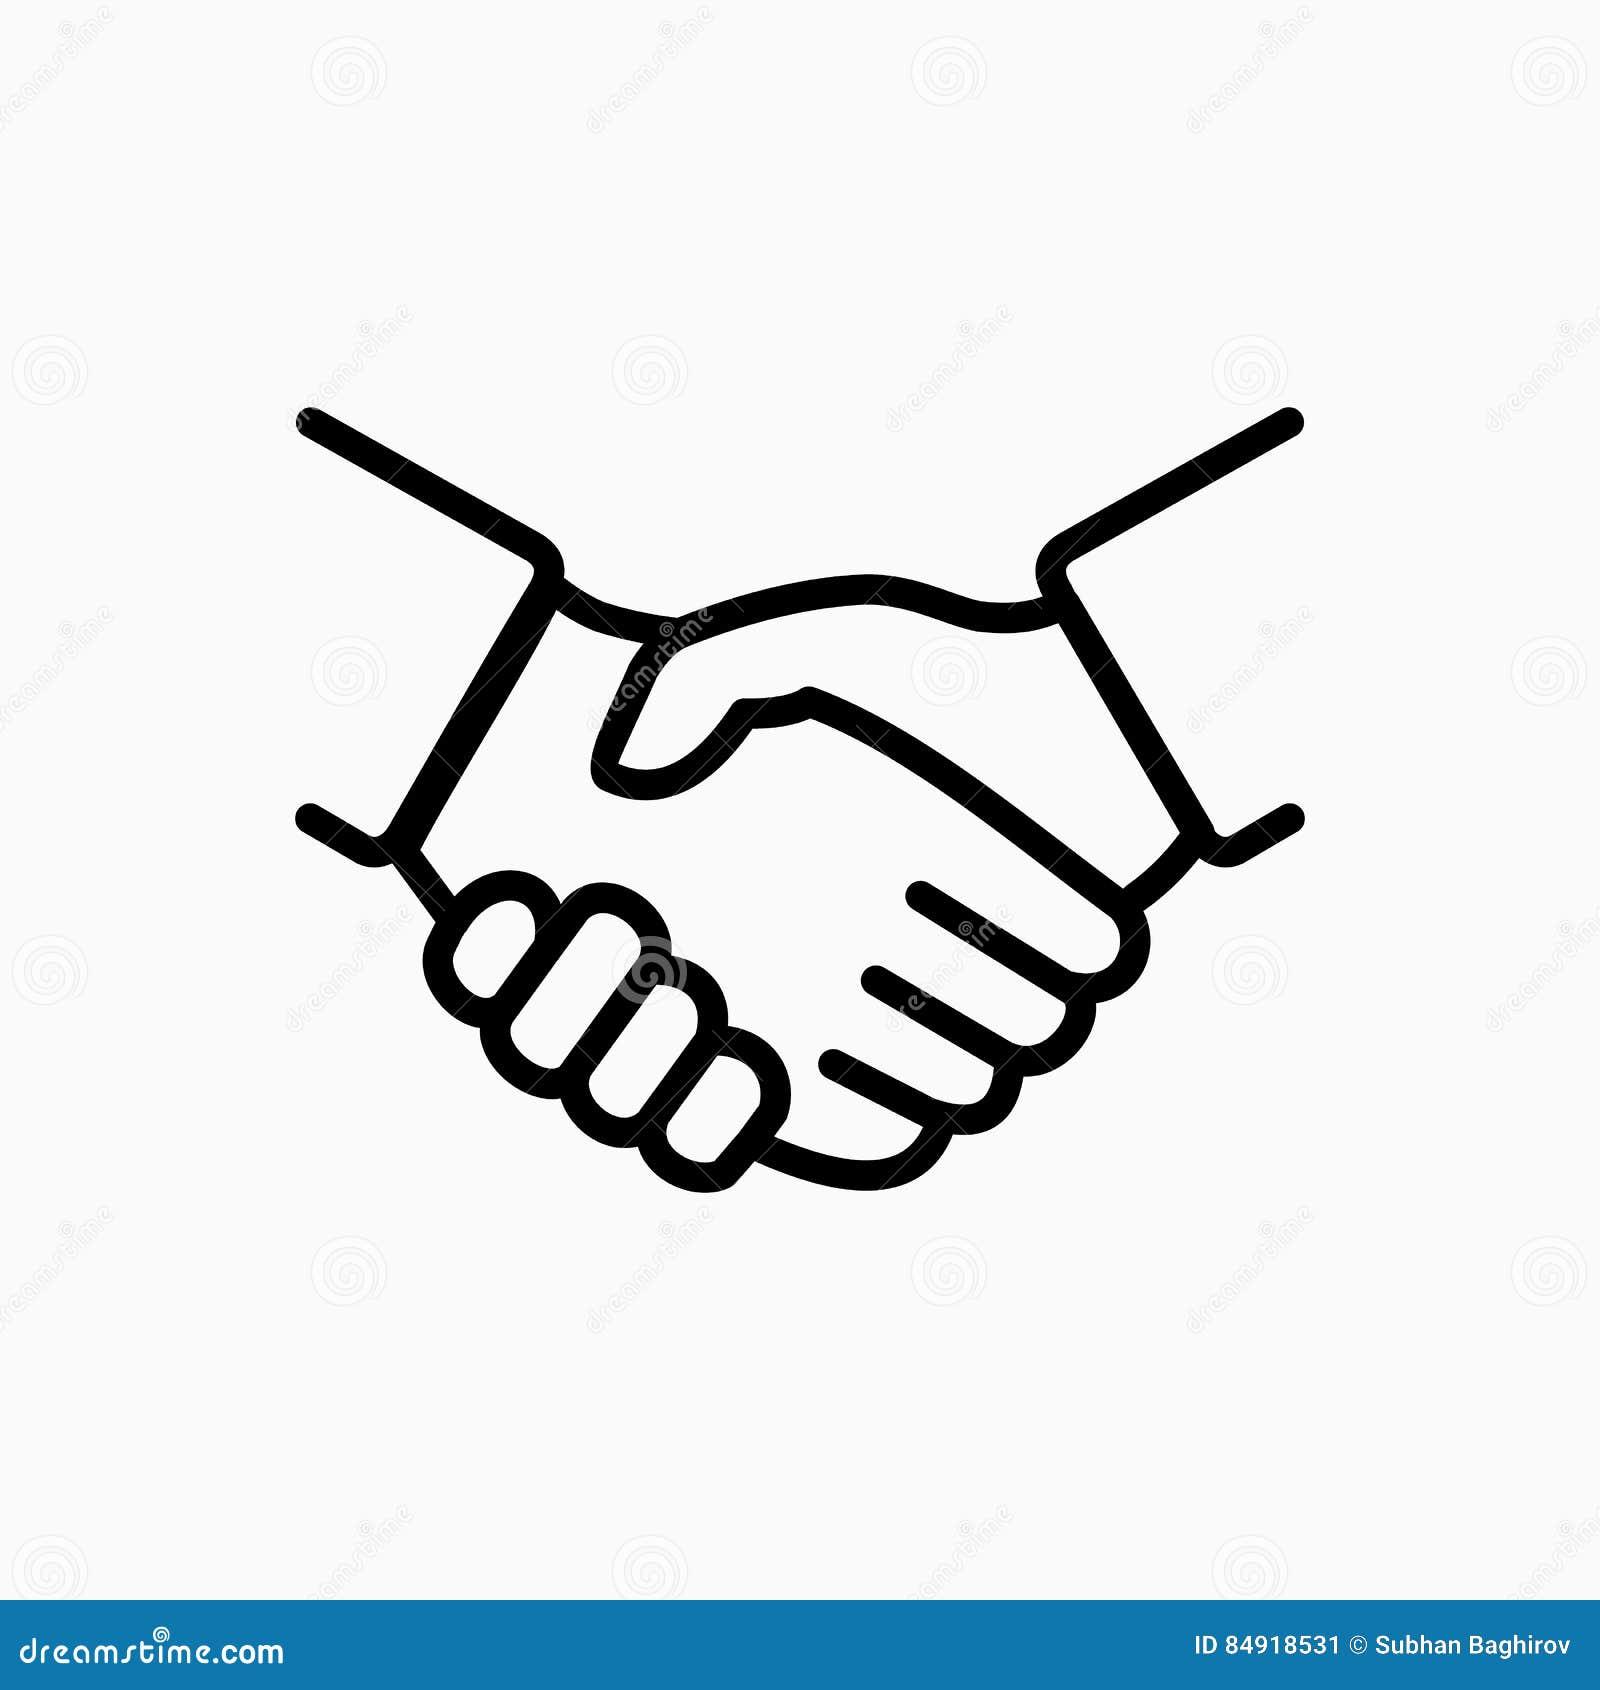 Handshake icon simple vector illustration. Deal or partner agreement symbol